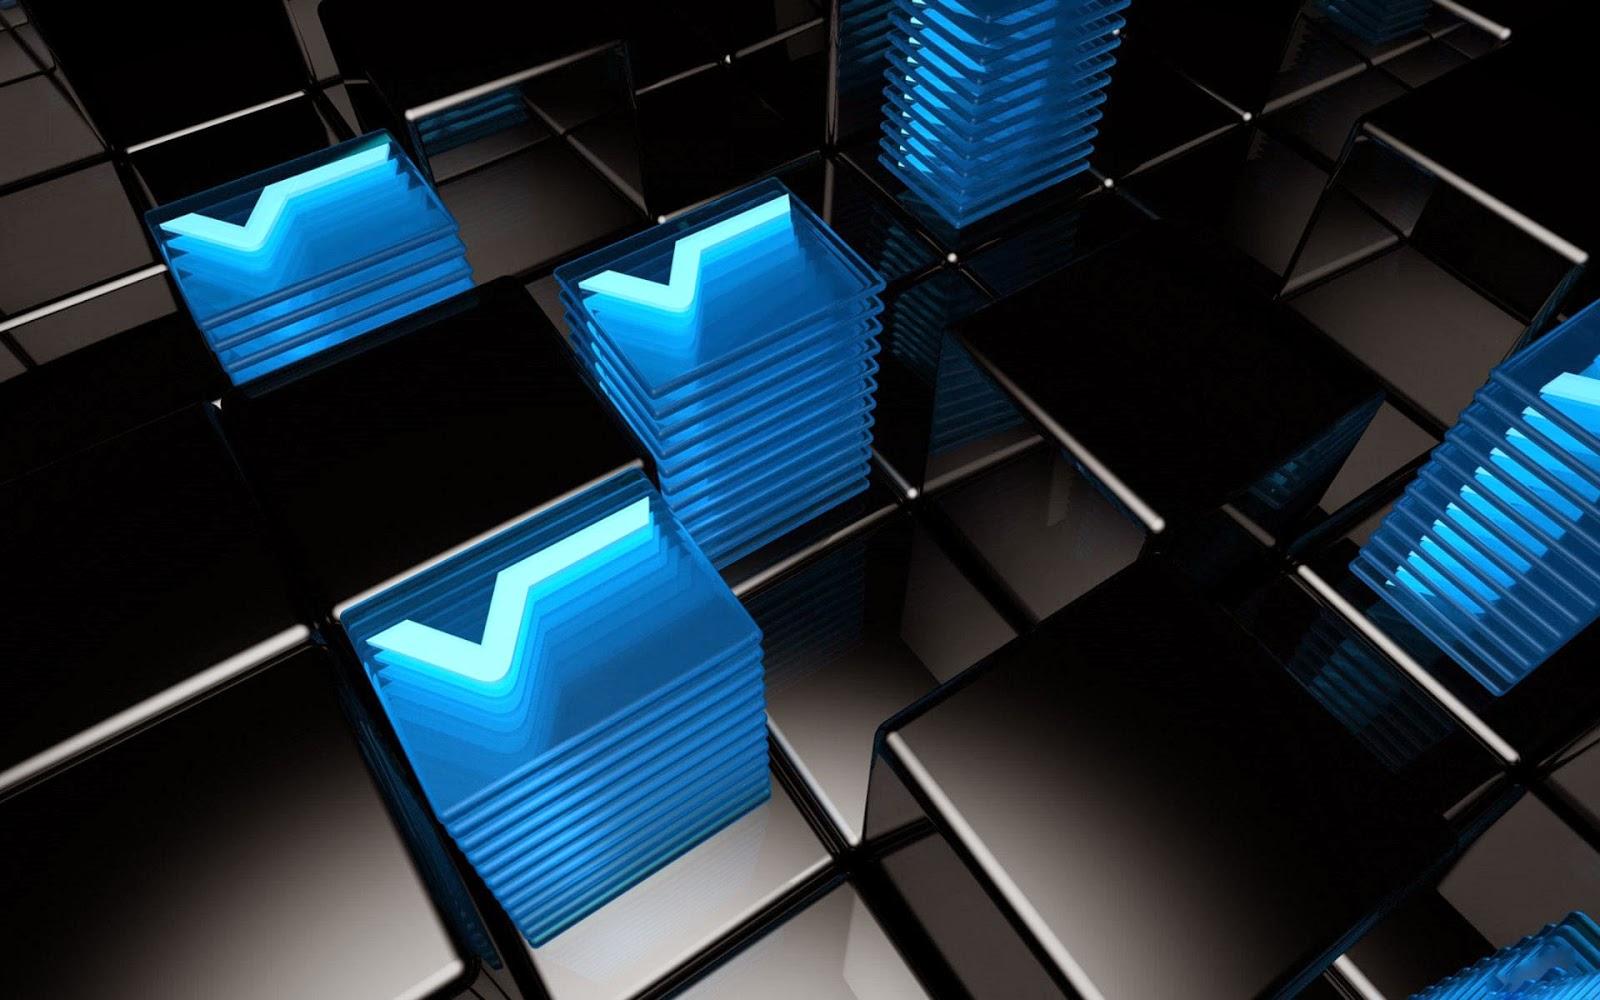 3D Abstract Desktop Wallpapers